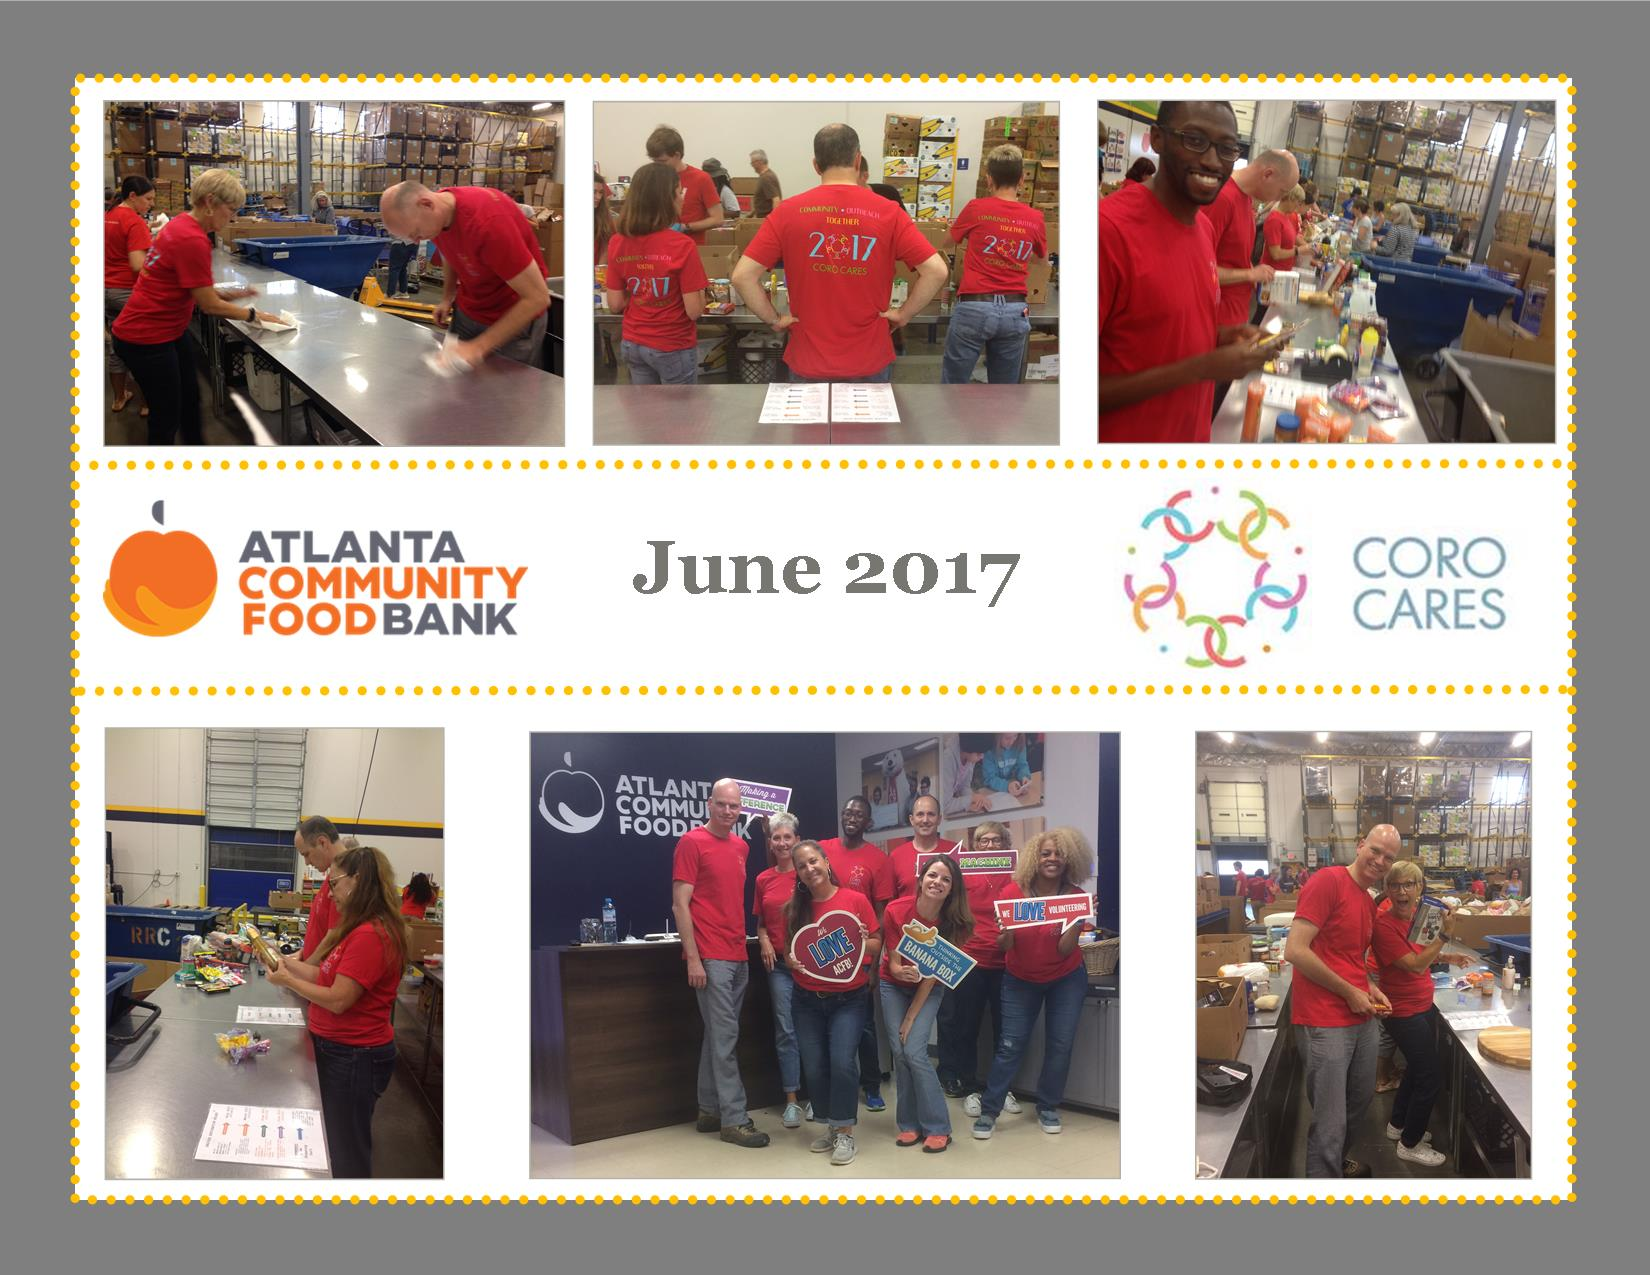 atlanta_community_food_bank_2017.jpg